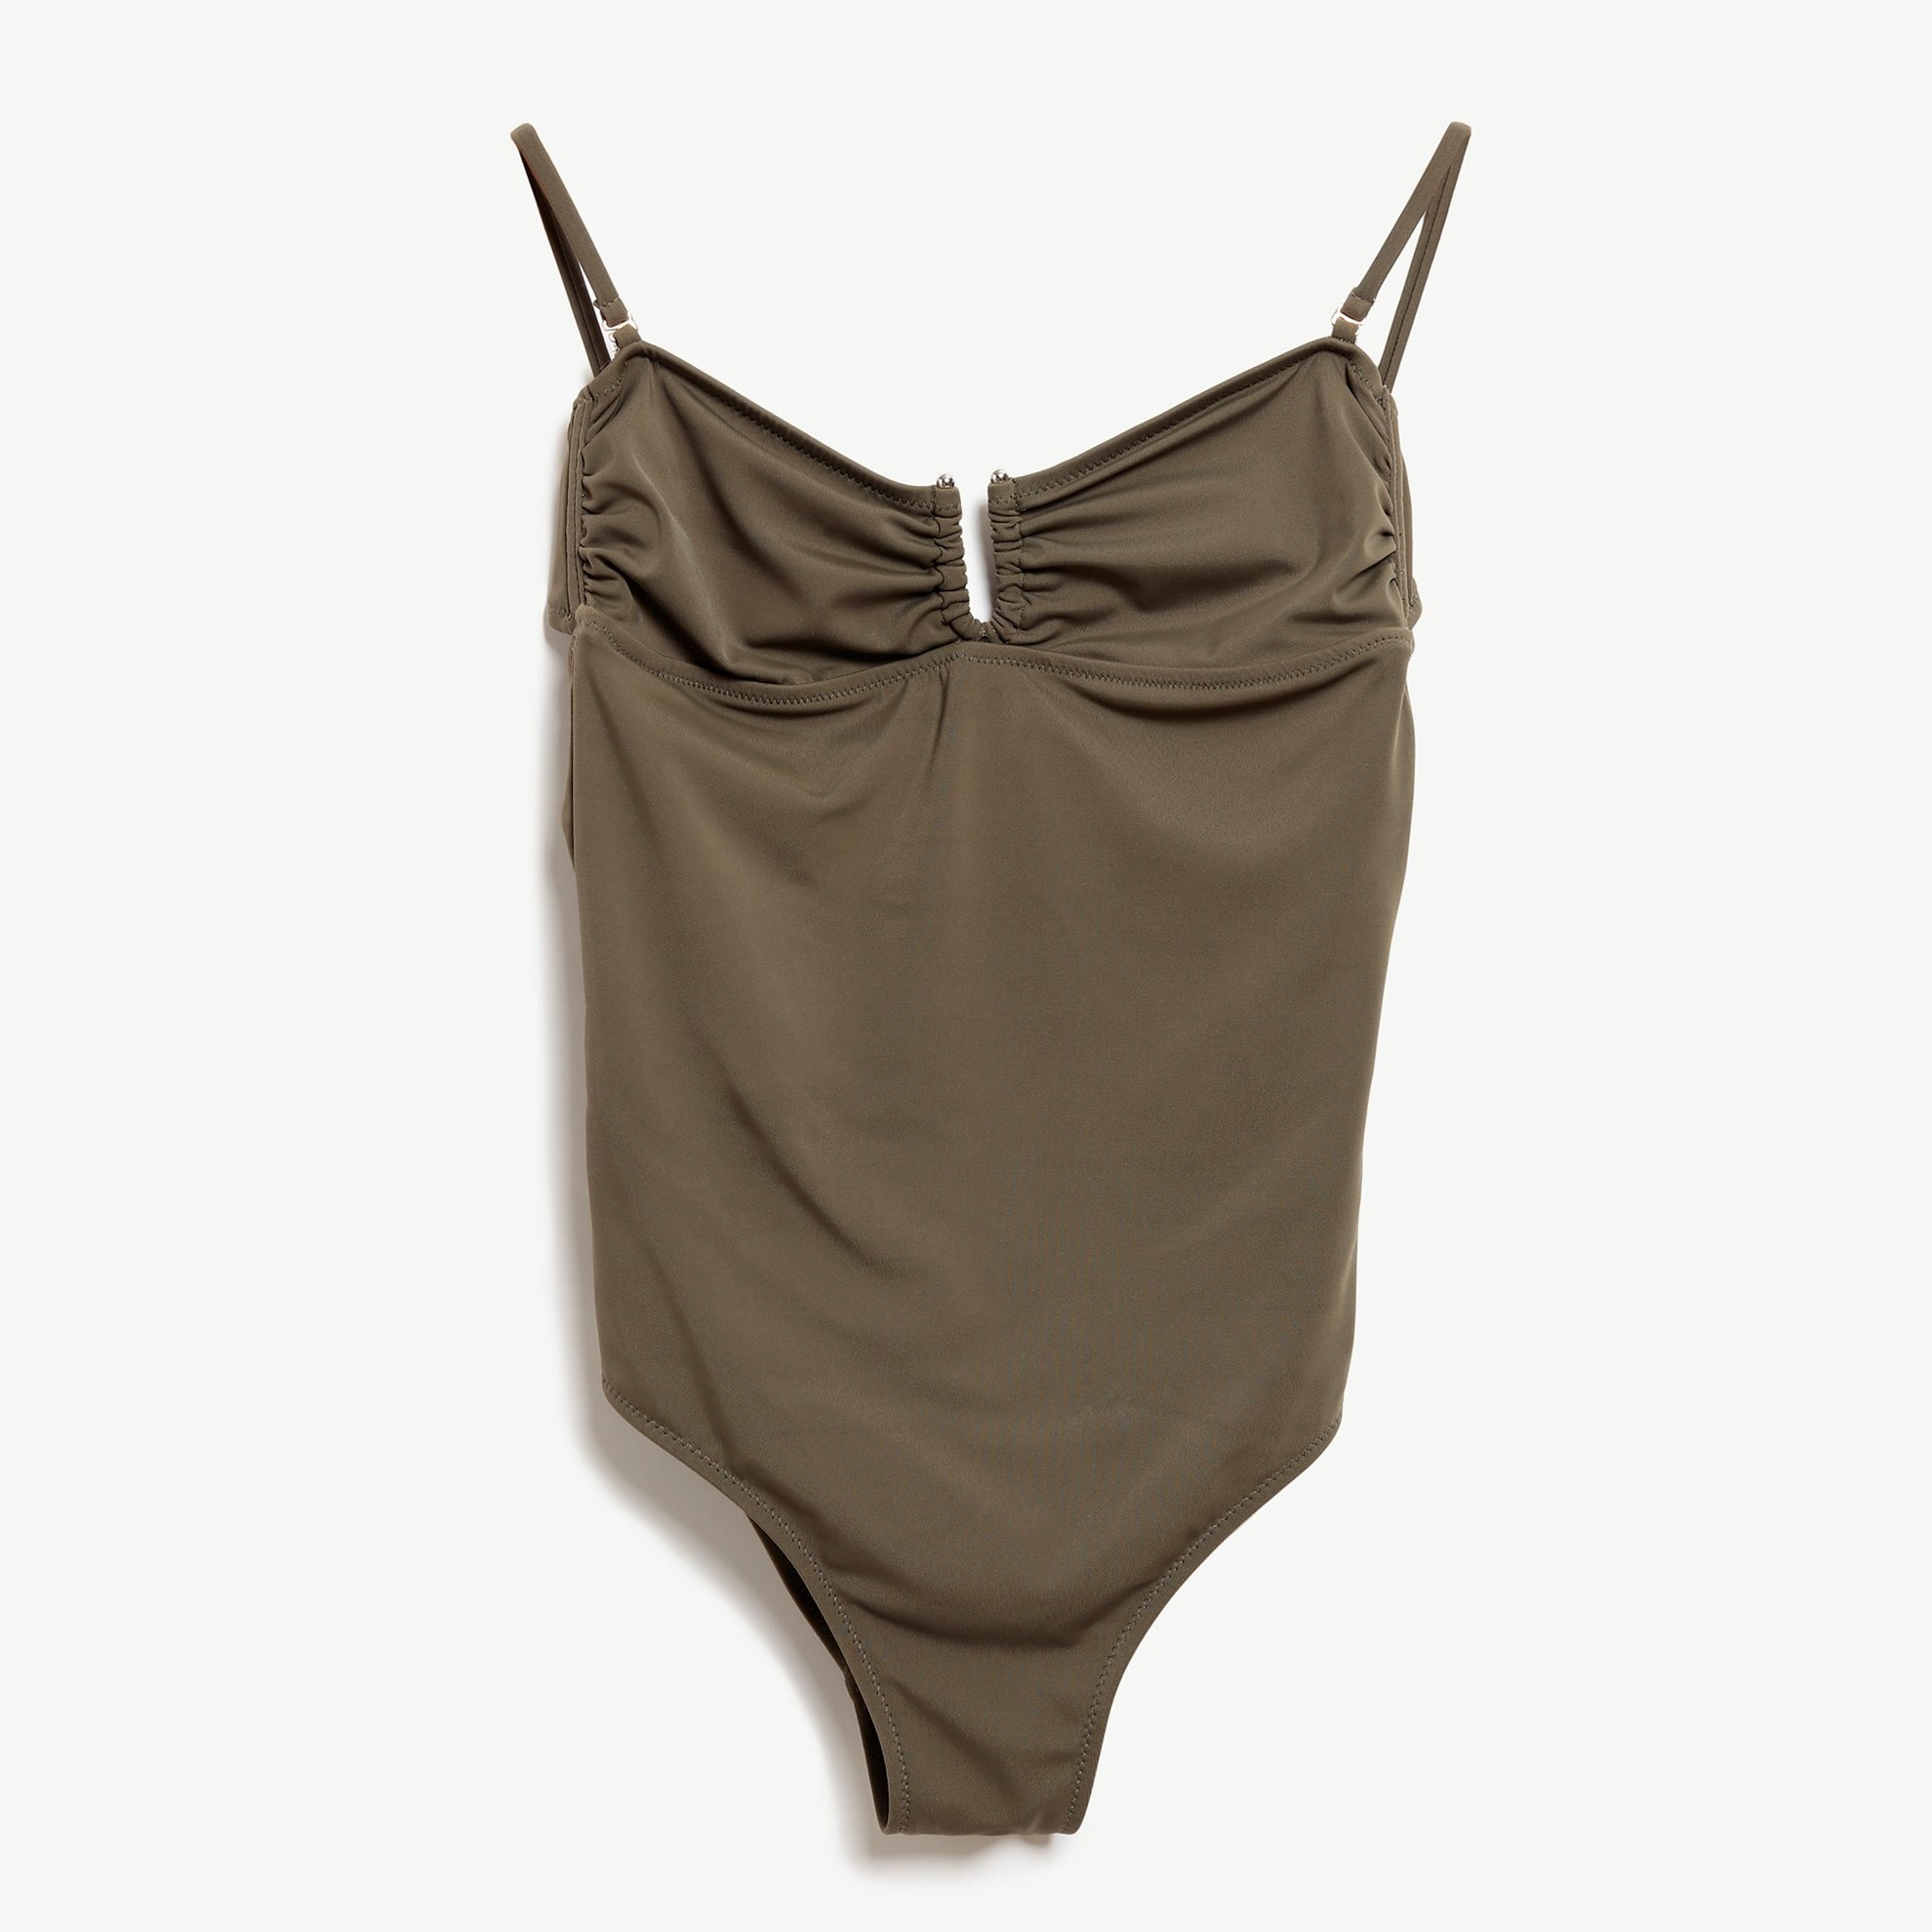 Tie On Back Swimsuit